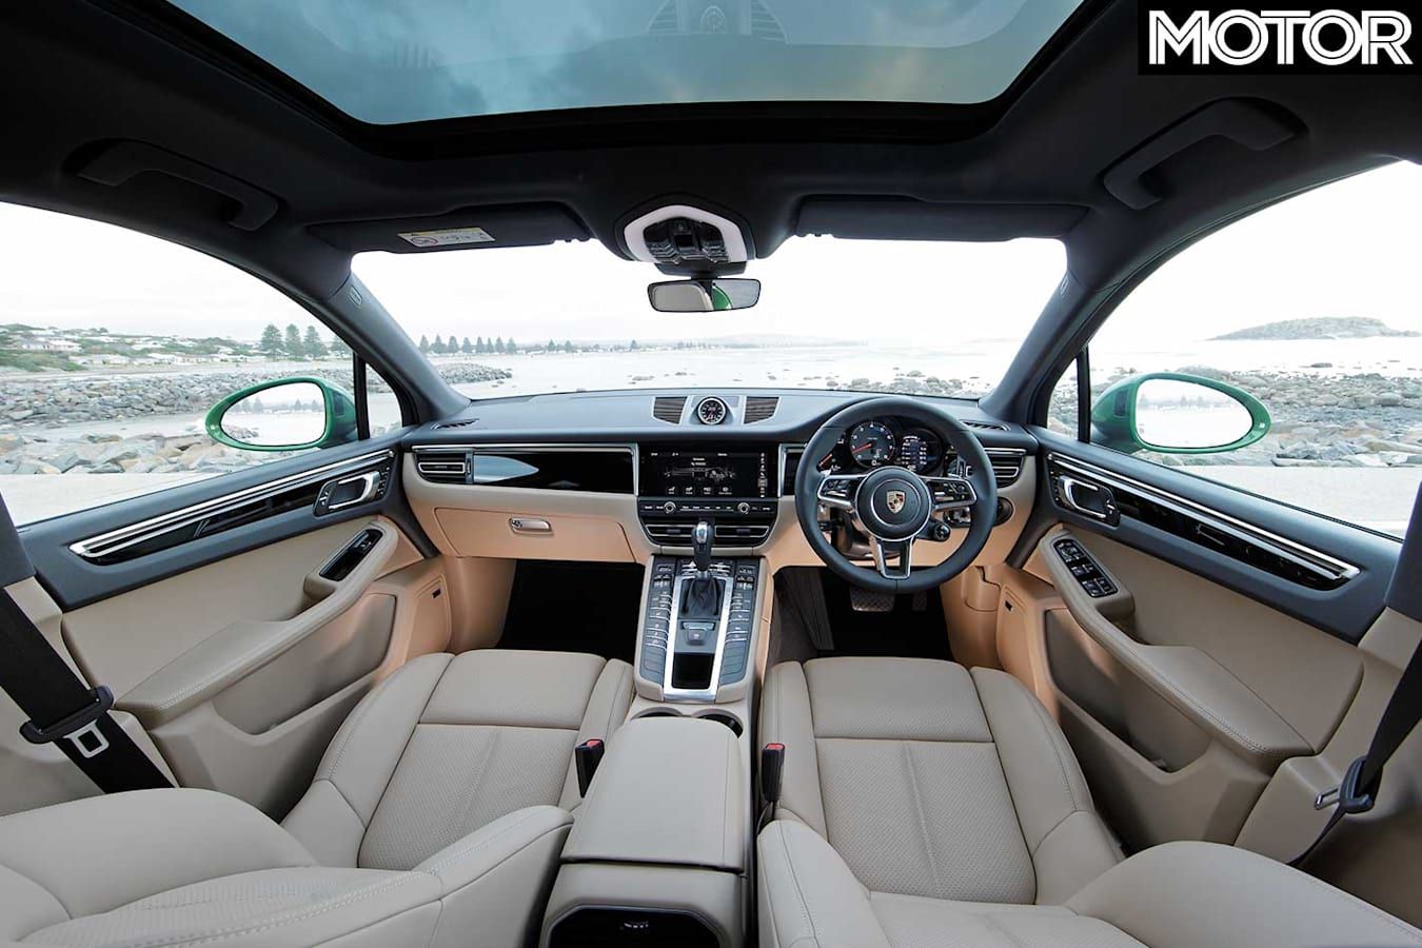 2019 Porsche Macan S Interior Jpg